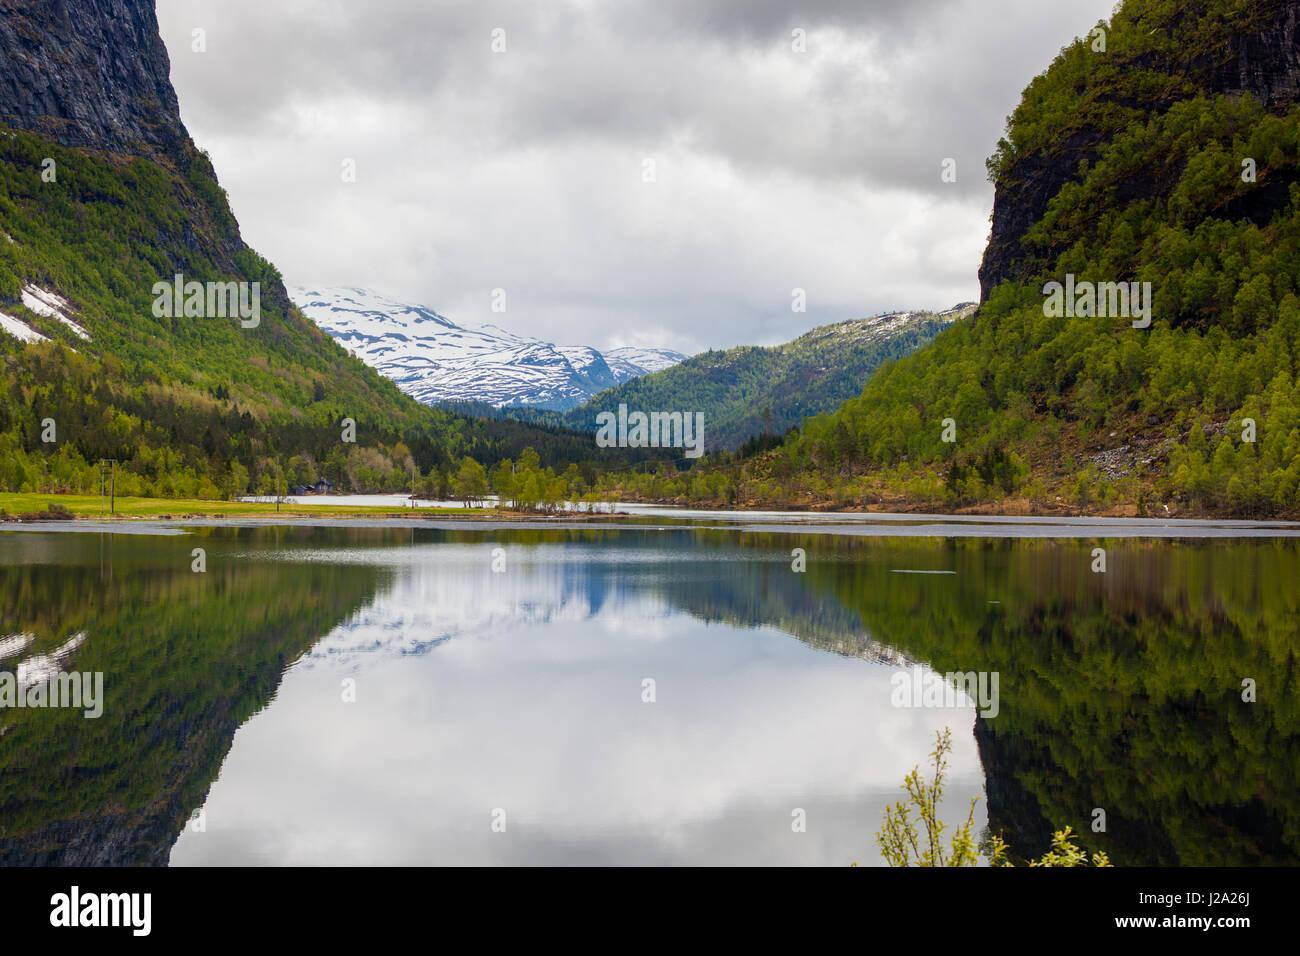 Typische Landschaft West in Norwegen Stockbild